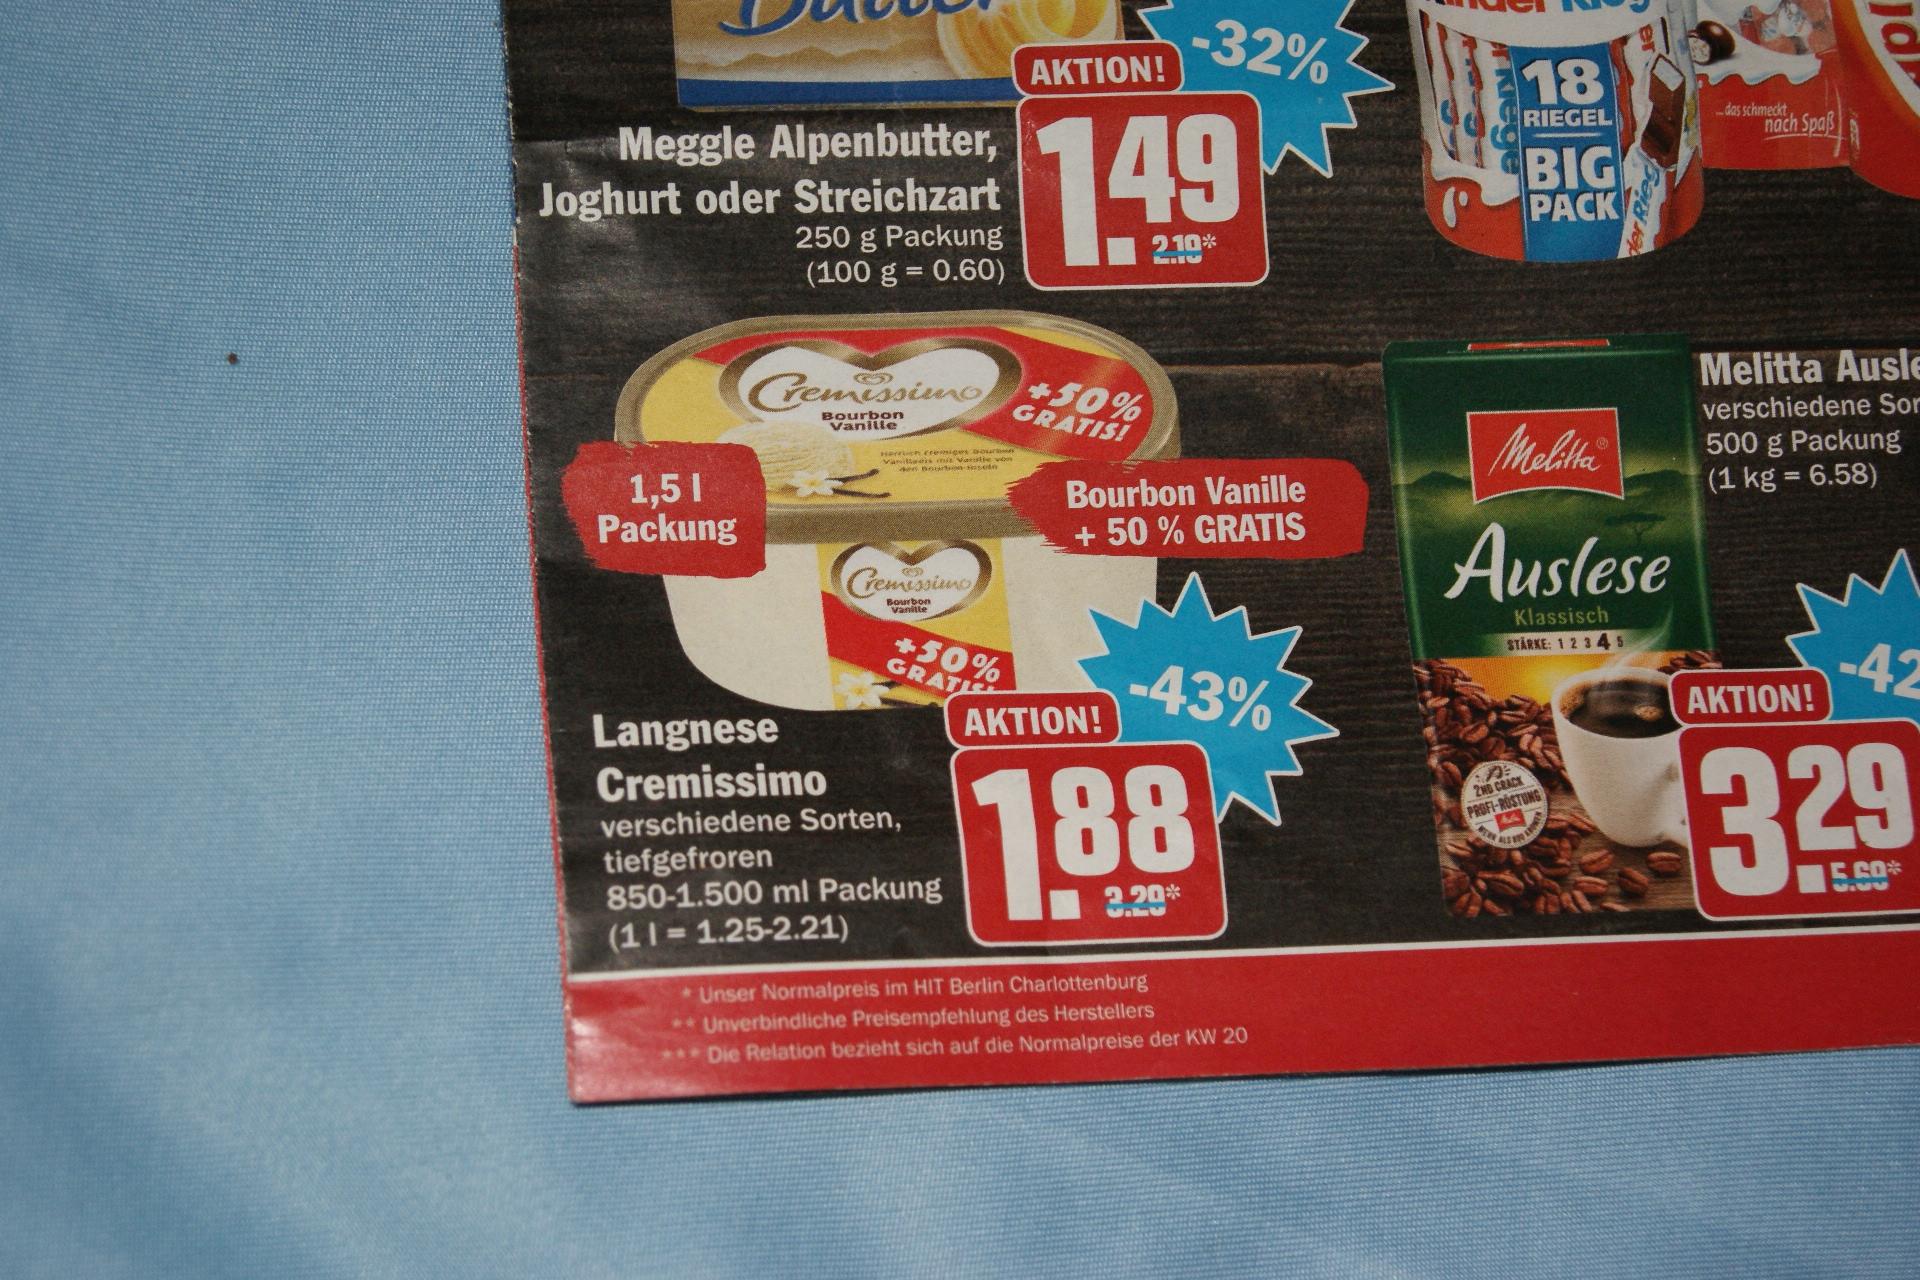 Langnese Cremissimo Bourbon Vanille +50% gratis (= 1.500ml) für 1,88 € (lokal Berlin)